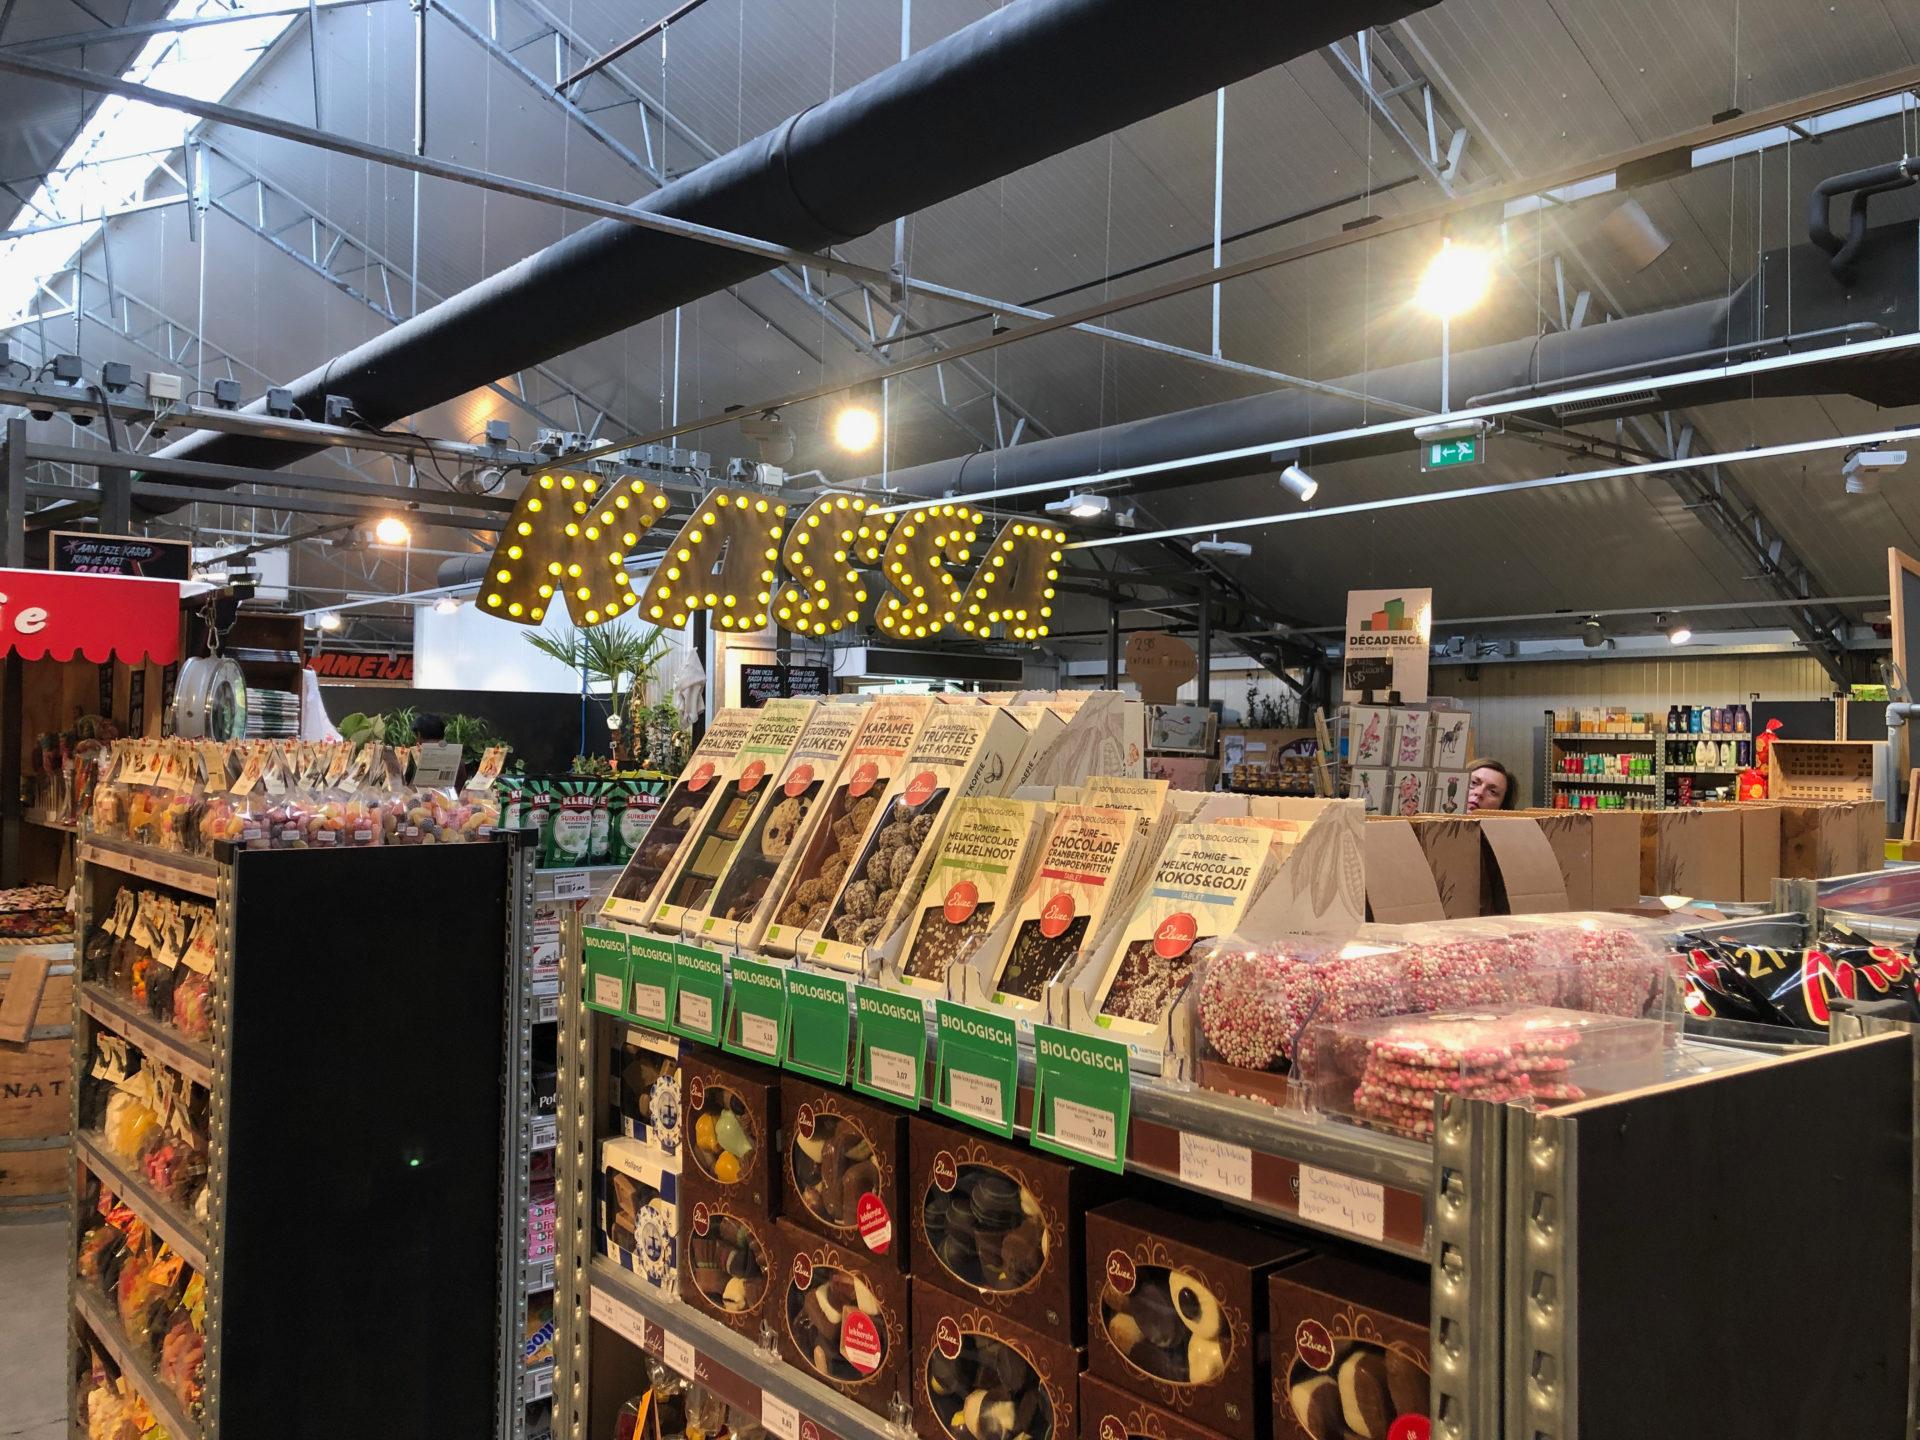 Regale im Supermarkt Landmarkt in Schellingwoude in Amsterdam Noord